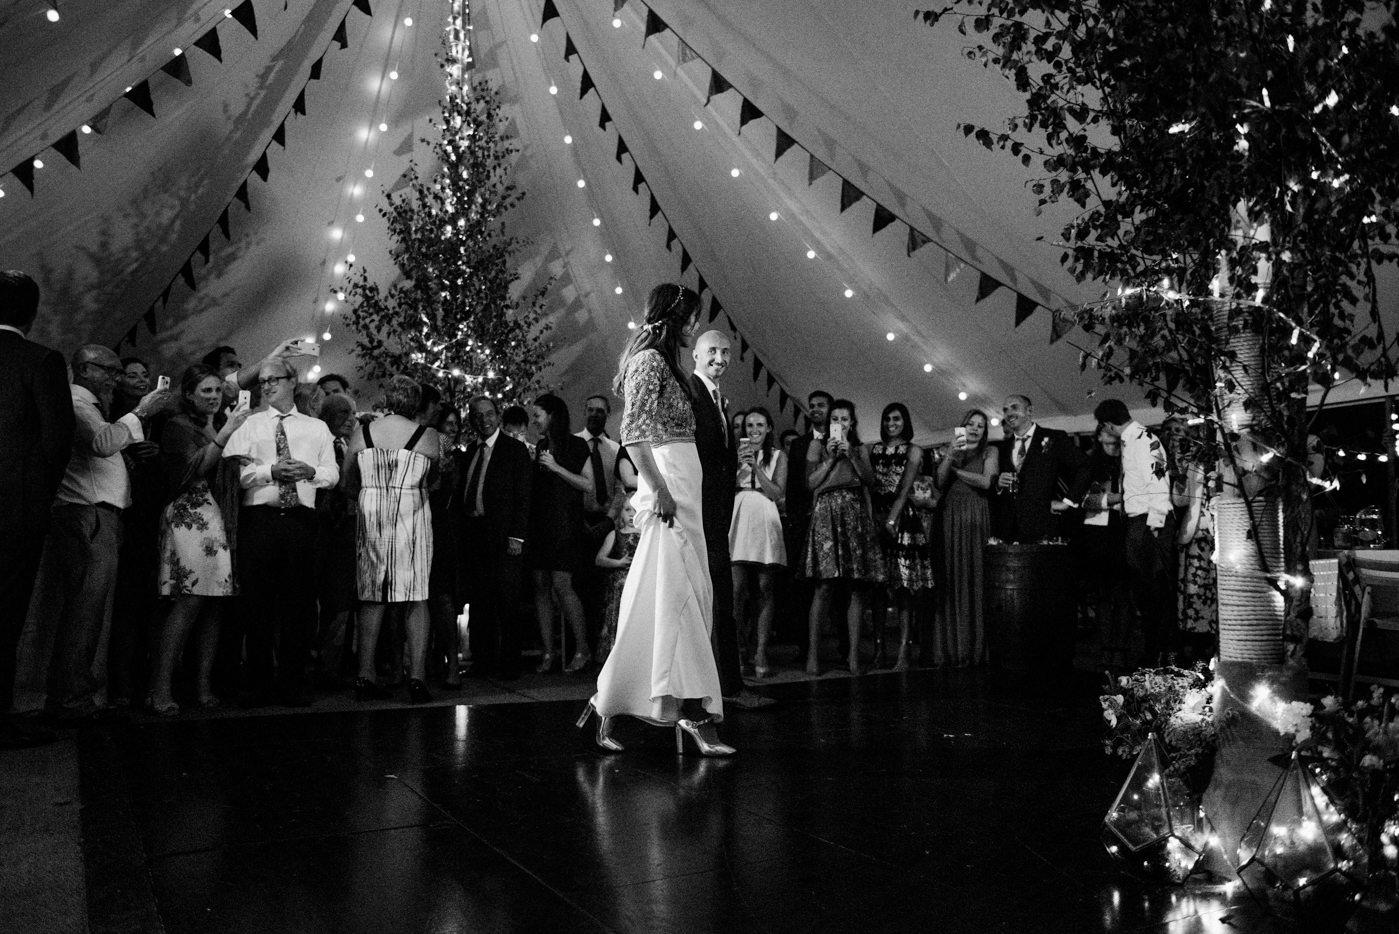 bignor-park-wedding-photography-robyn-and-tom-118